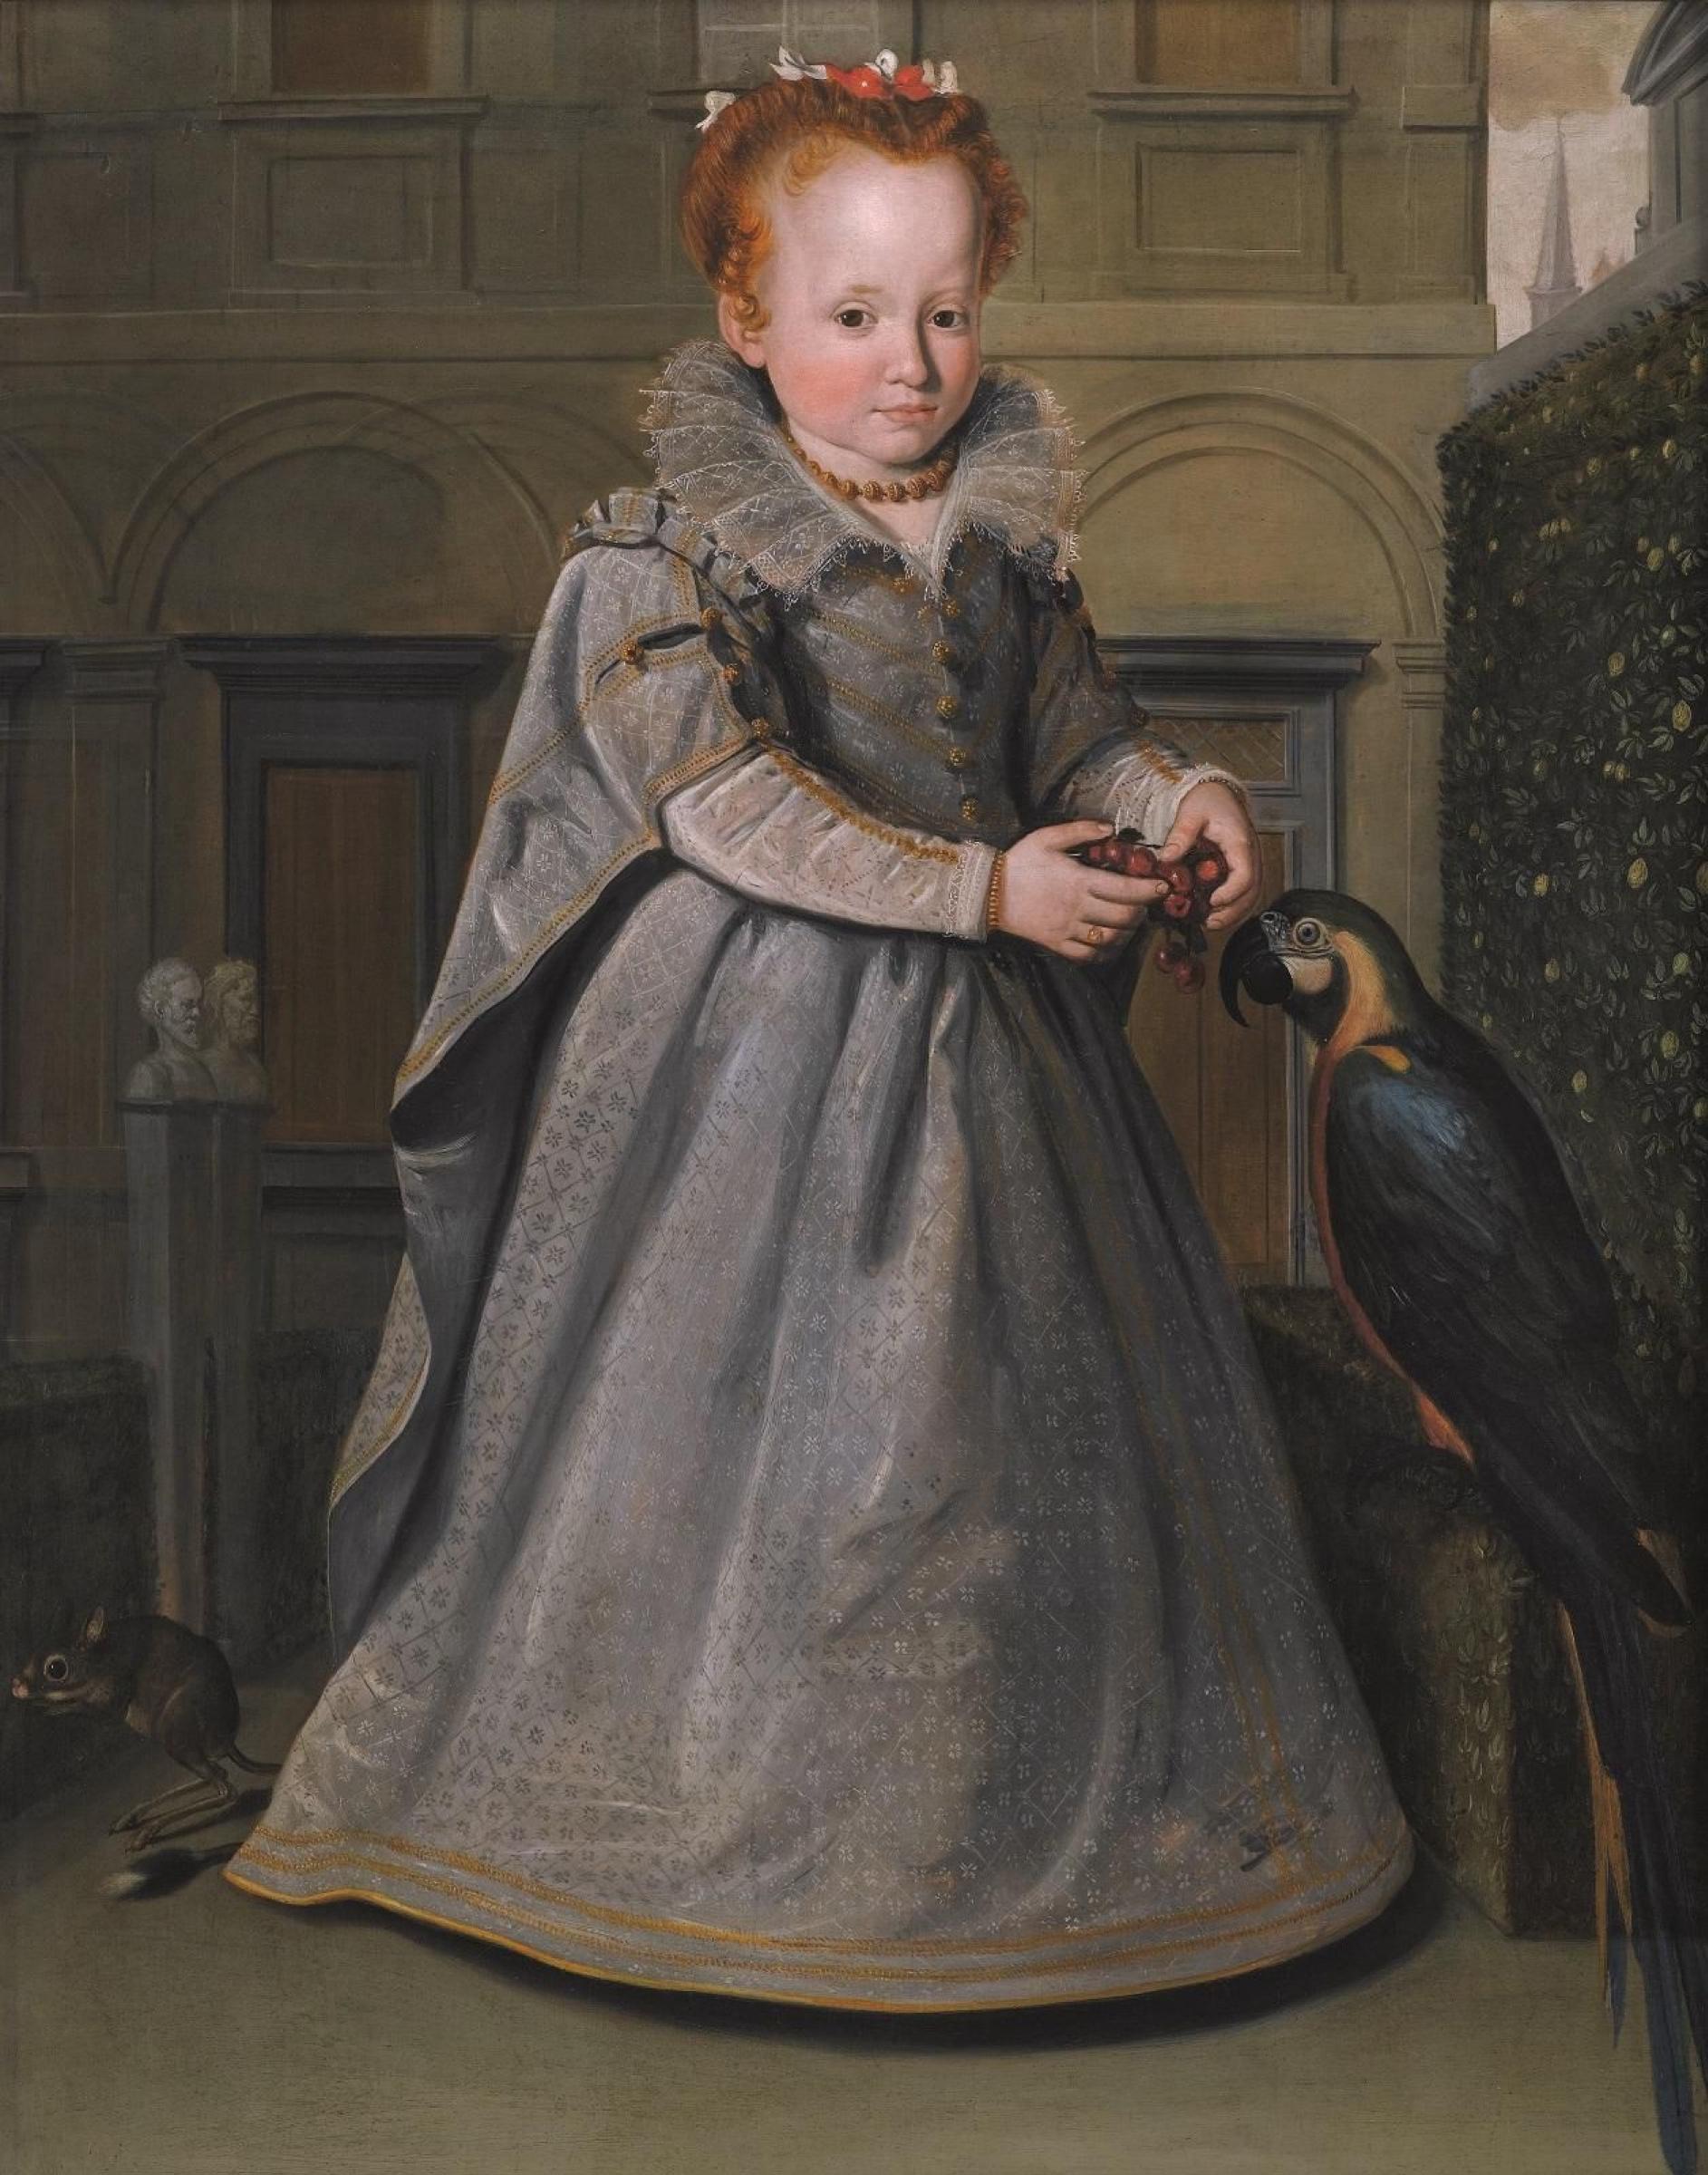 Санти ди Тито. Портрет Лукреции (Эмилии), дочери Никколо ди Синибальдо Гадди